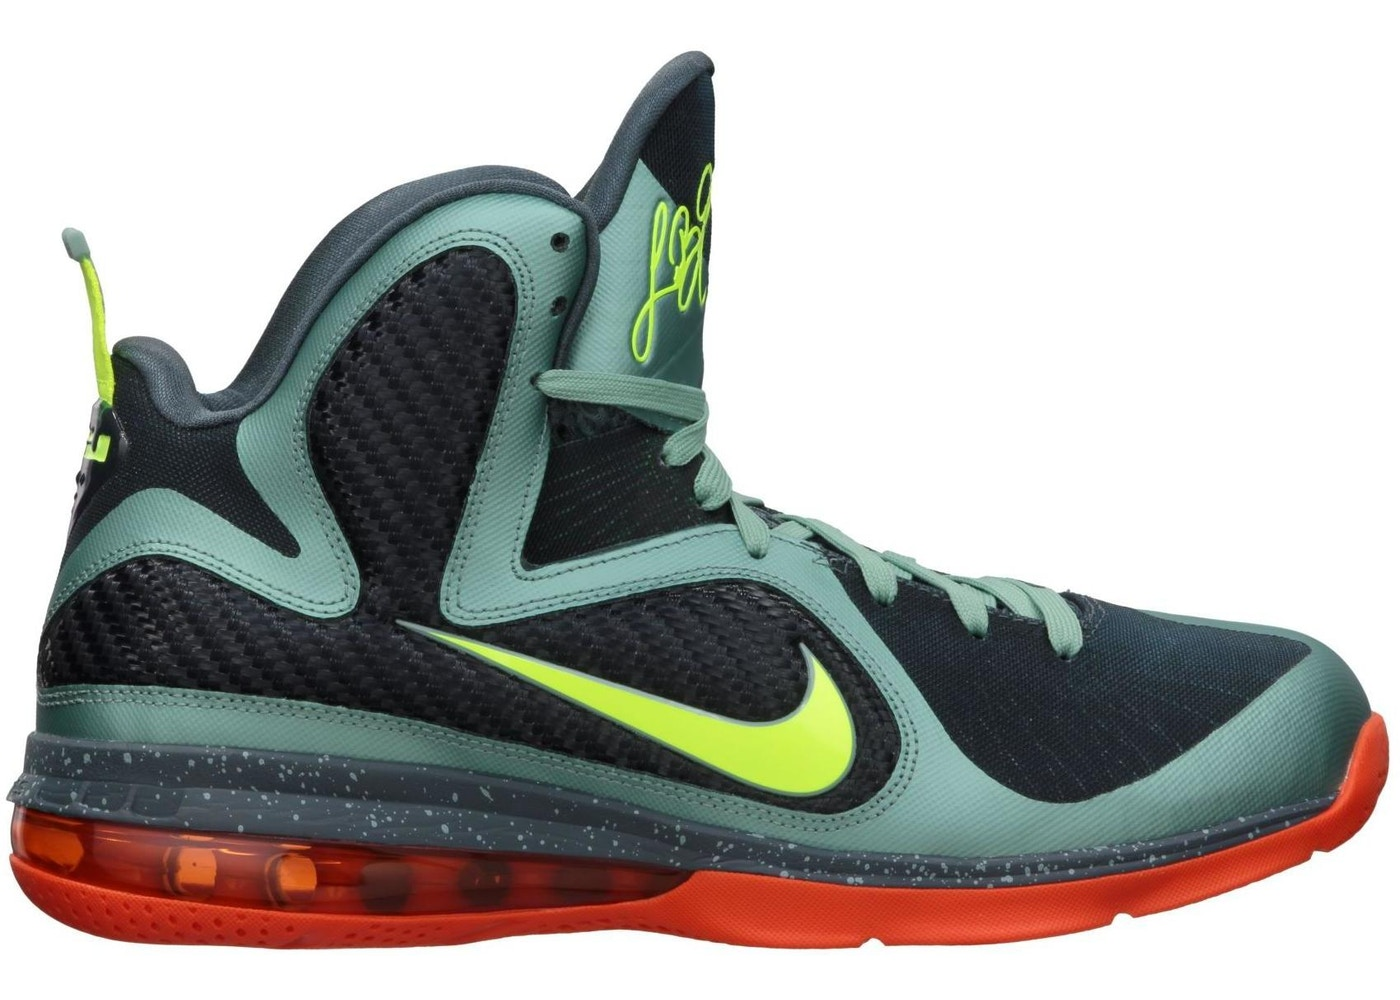 on sale 0ea00 4caca Buy Nike LeBron 9 Shoes   Deadstock Sneakers